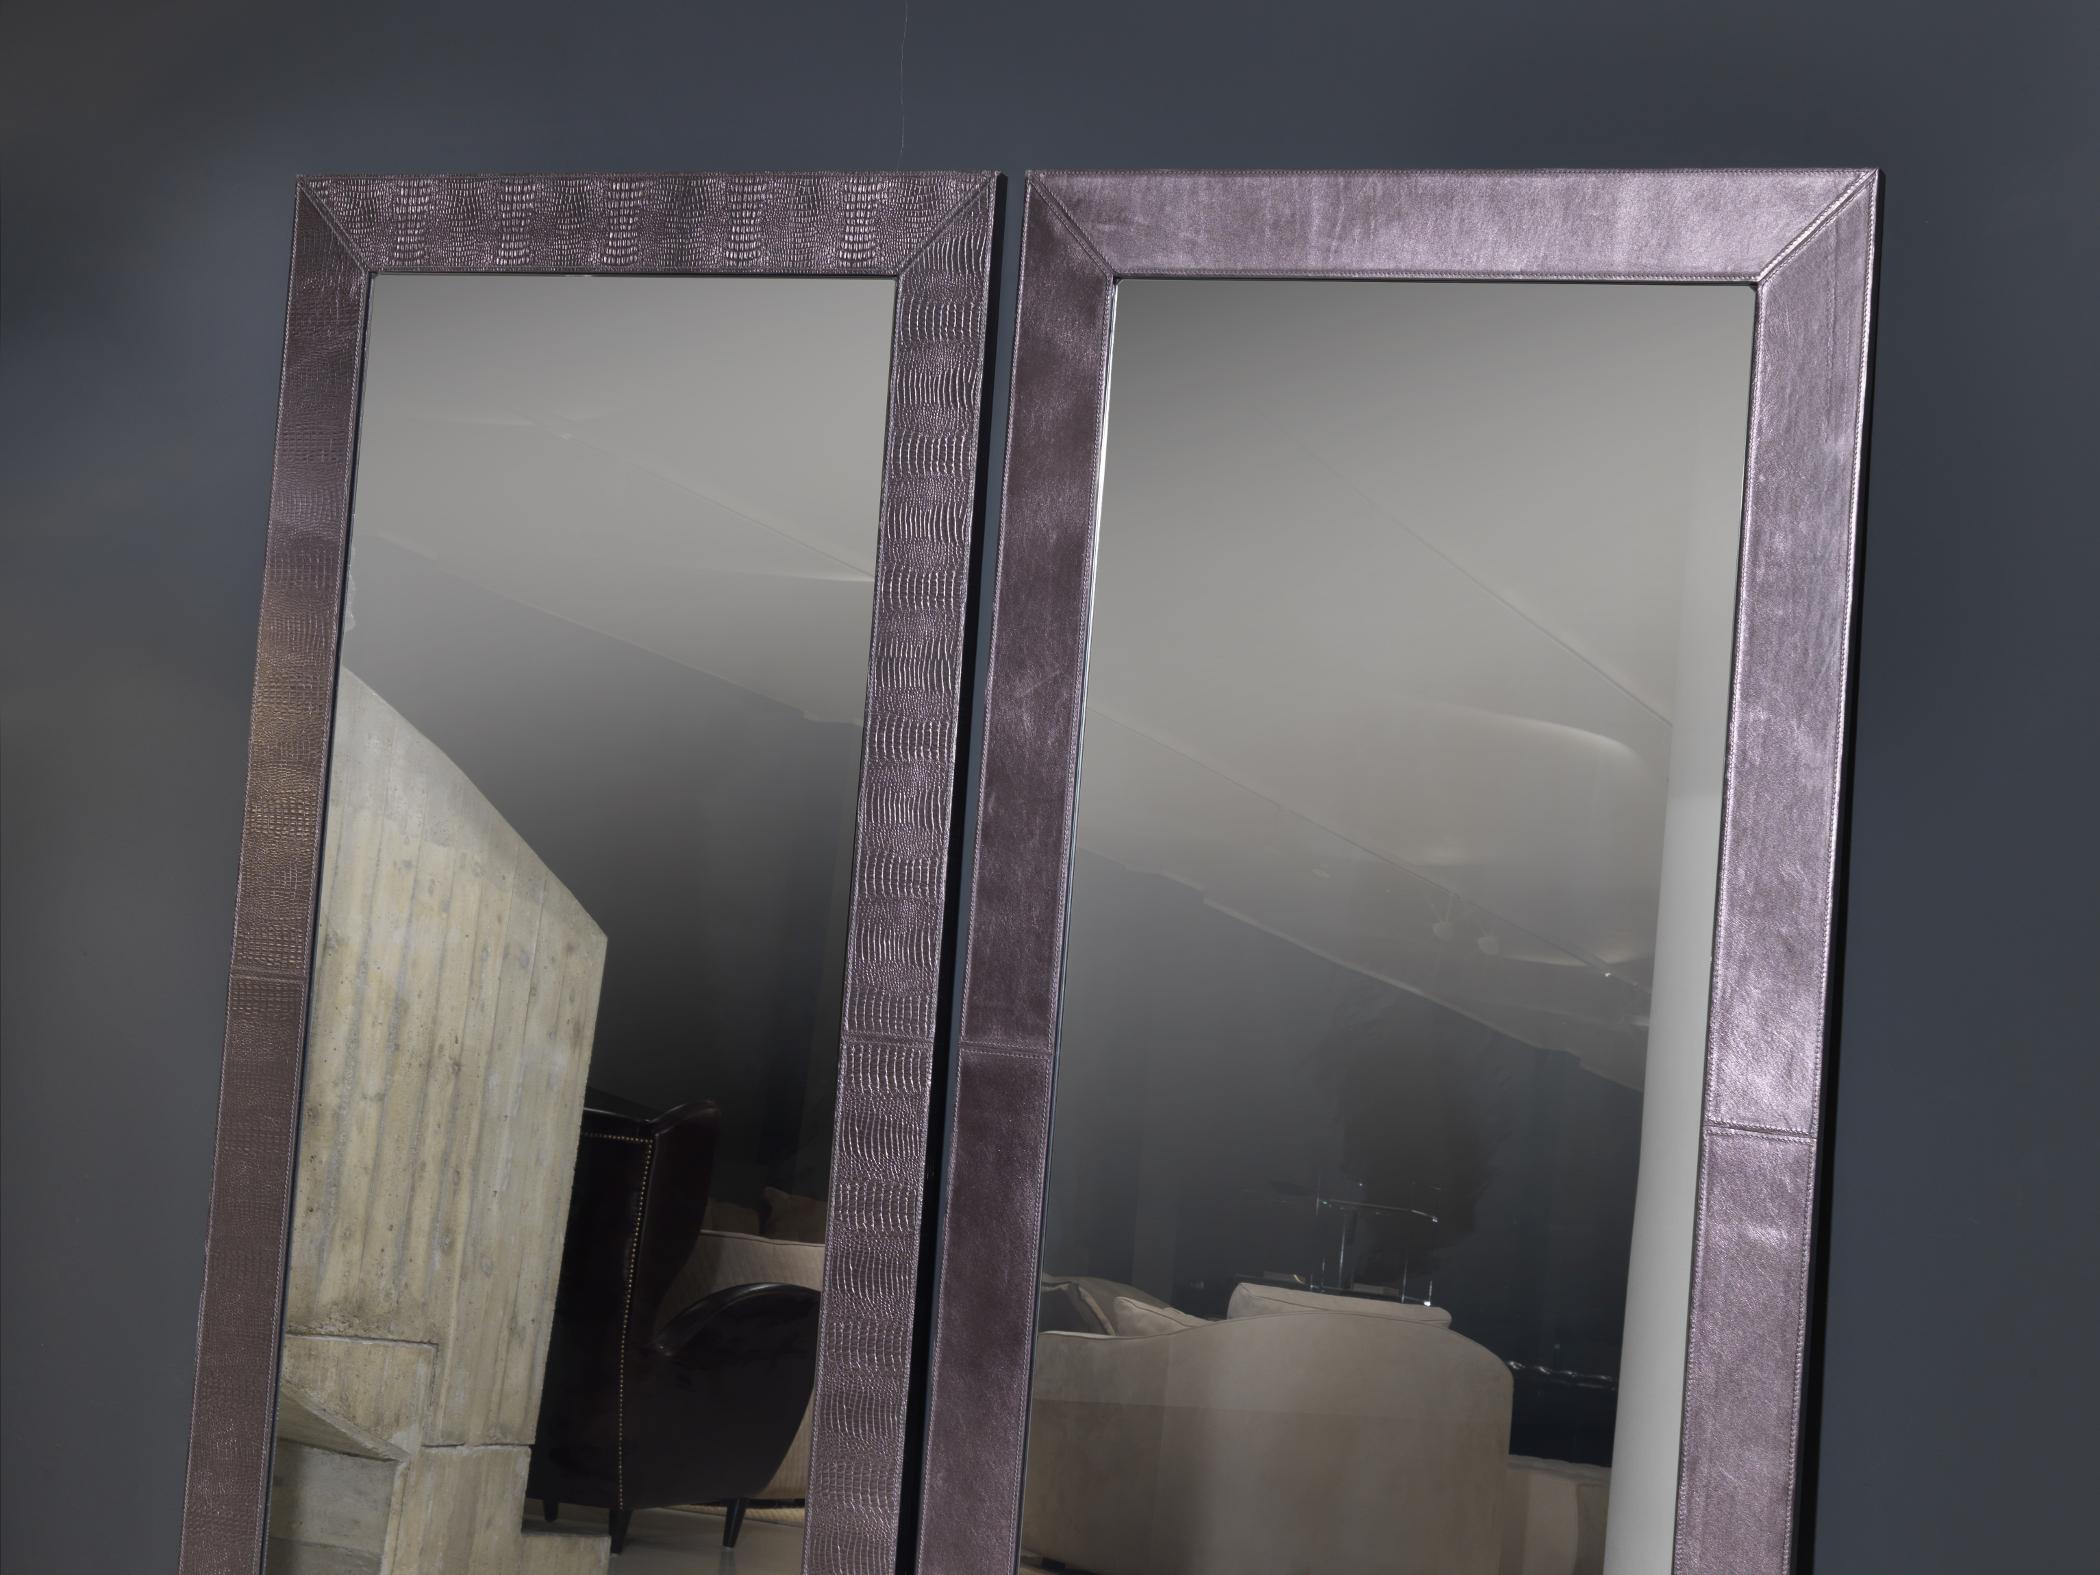 Specchi rettangolari eleganti moderniin pelle Mirror, Mirror